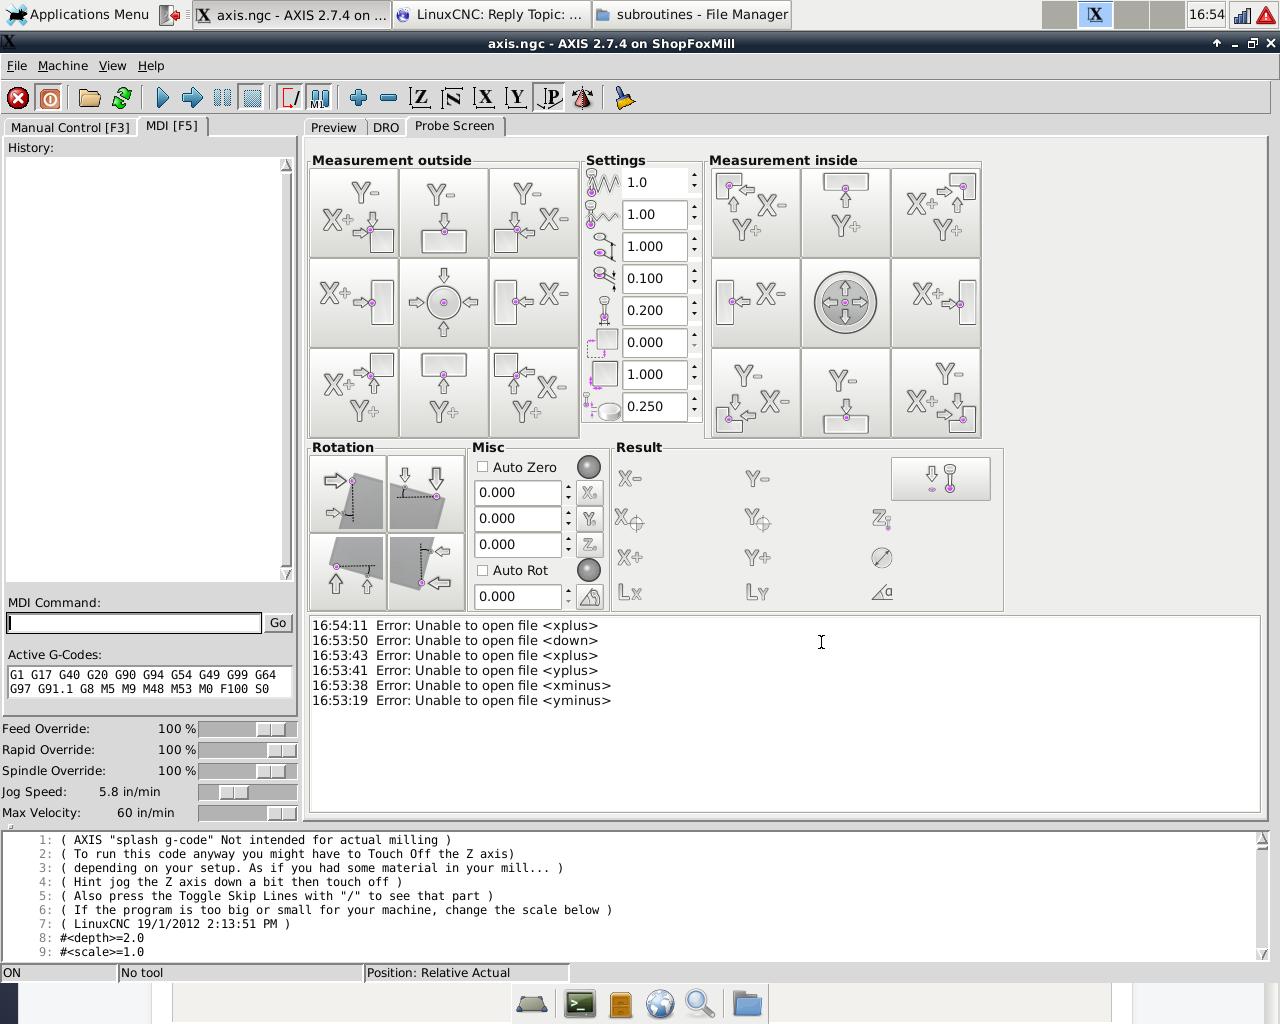 Screenshot-03212016-04:55:04PM.png